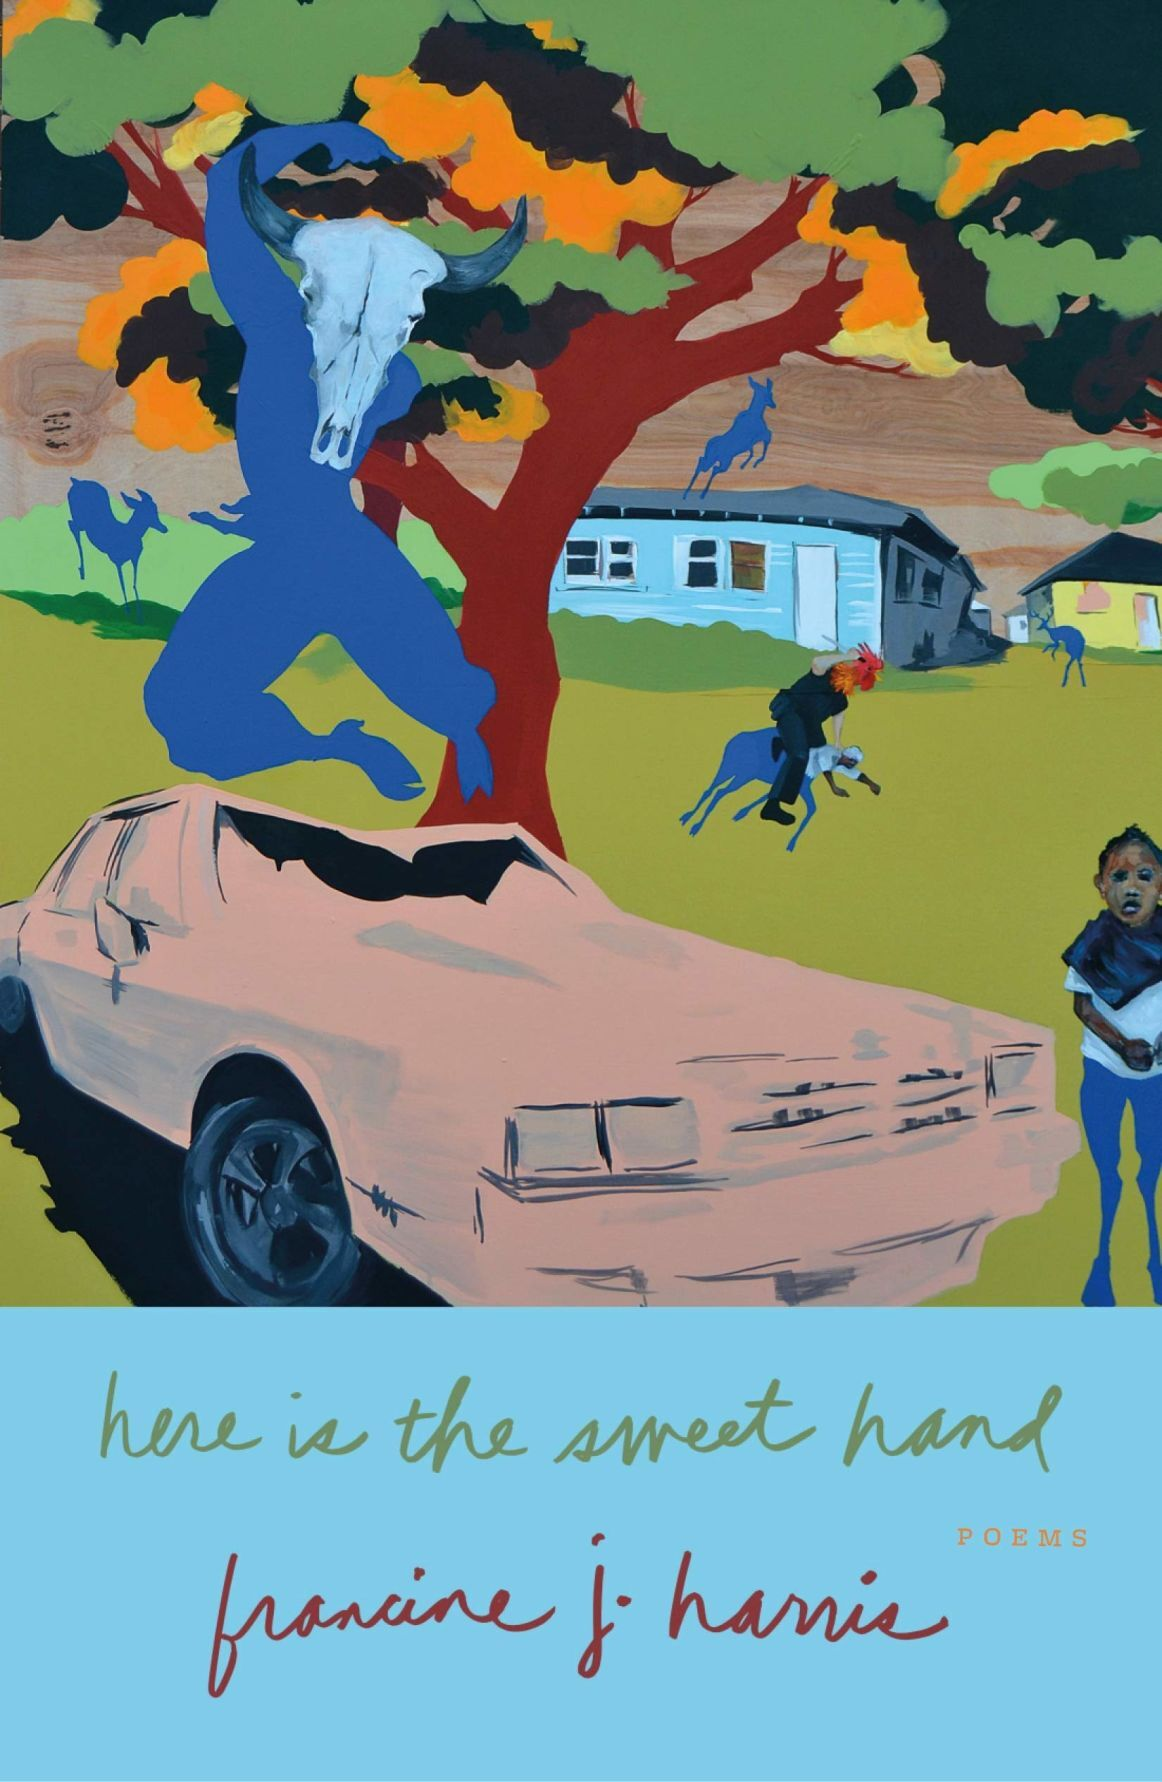 Francine J. Harris' 'here is the sweet hand'